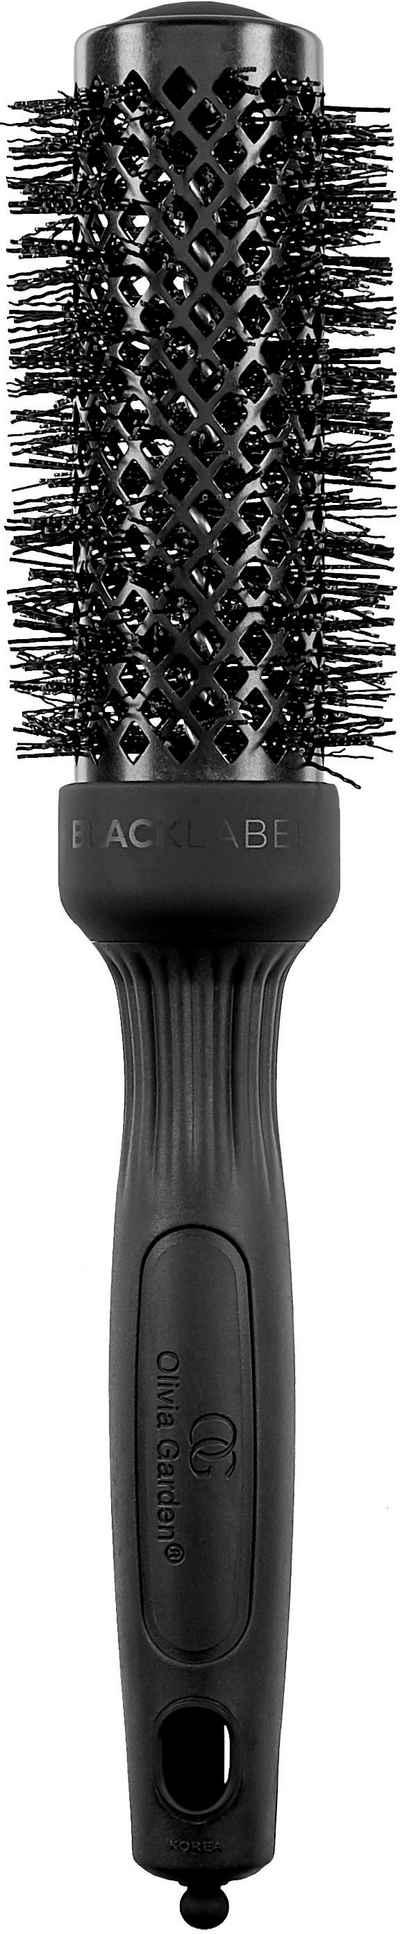 OLIVIA GARDEN Rundbürste »Olivia Garden Thermal Black Label 34/50 mm«